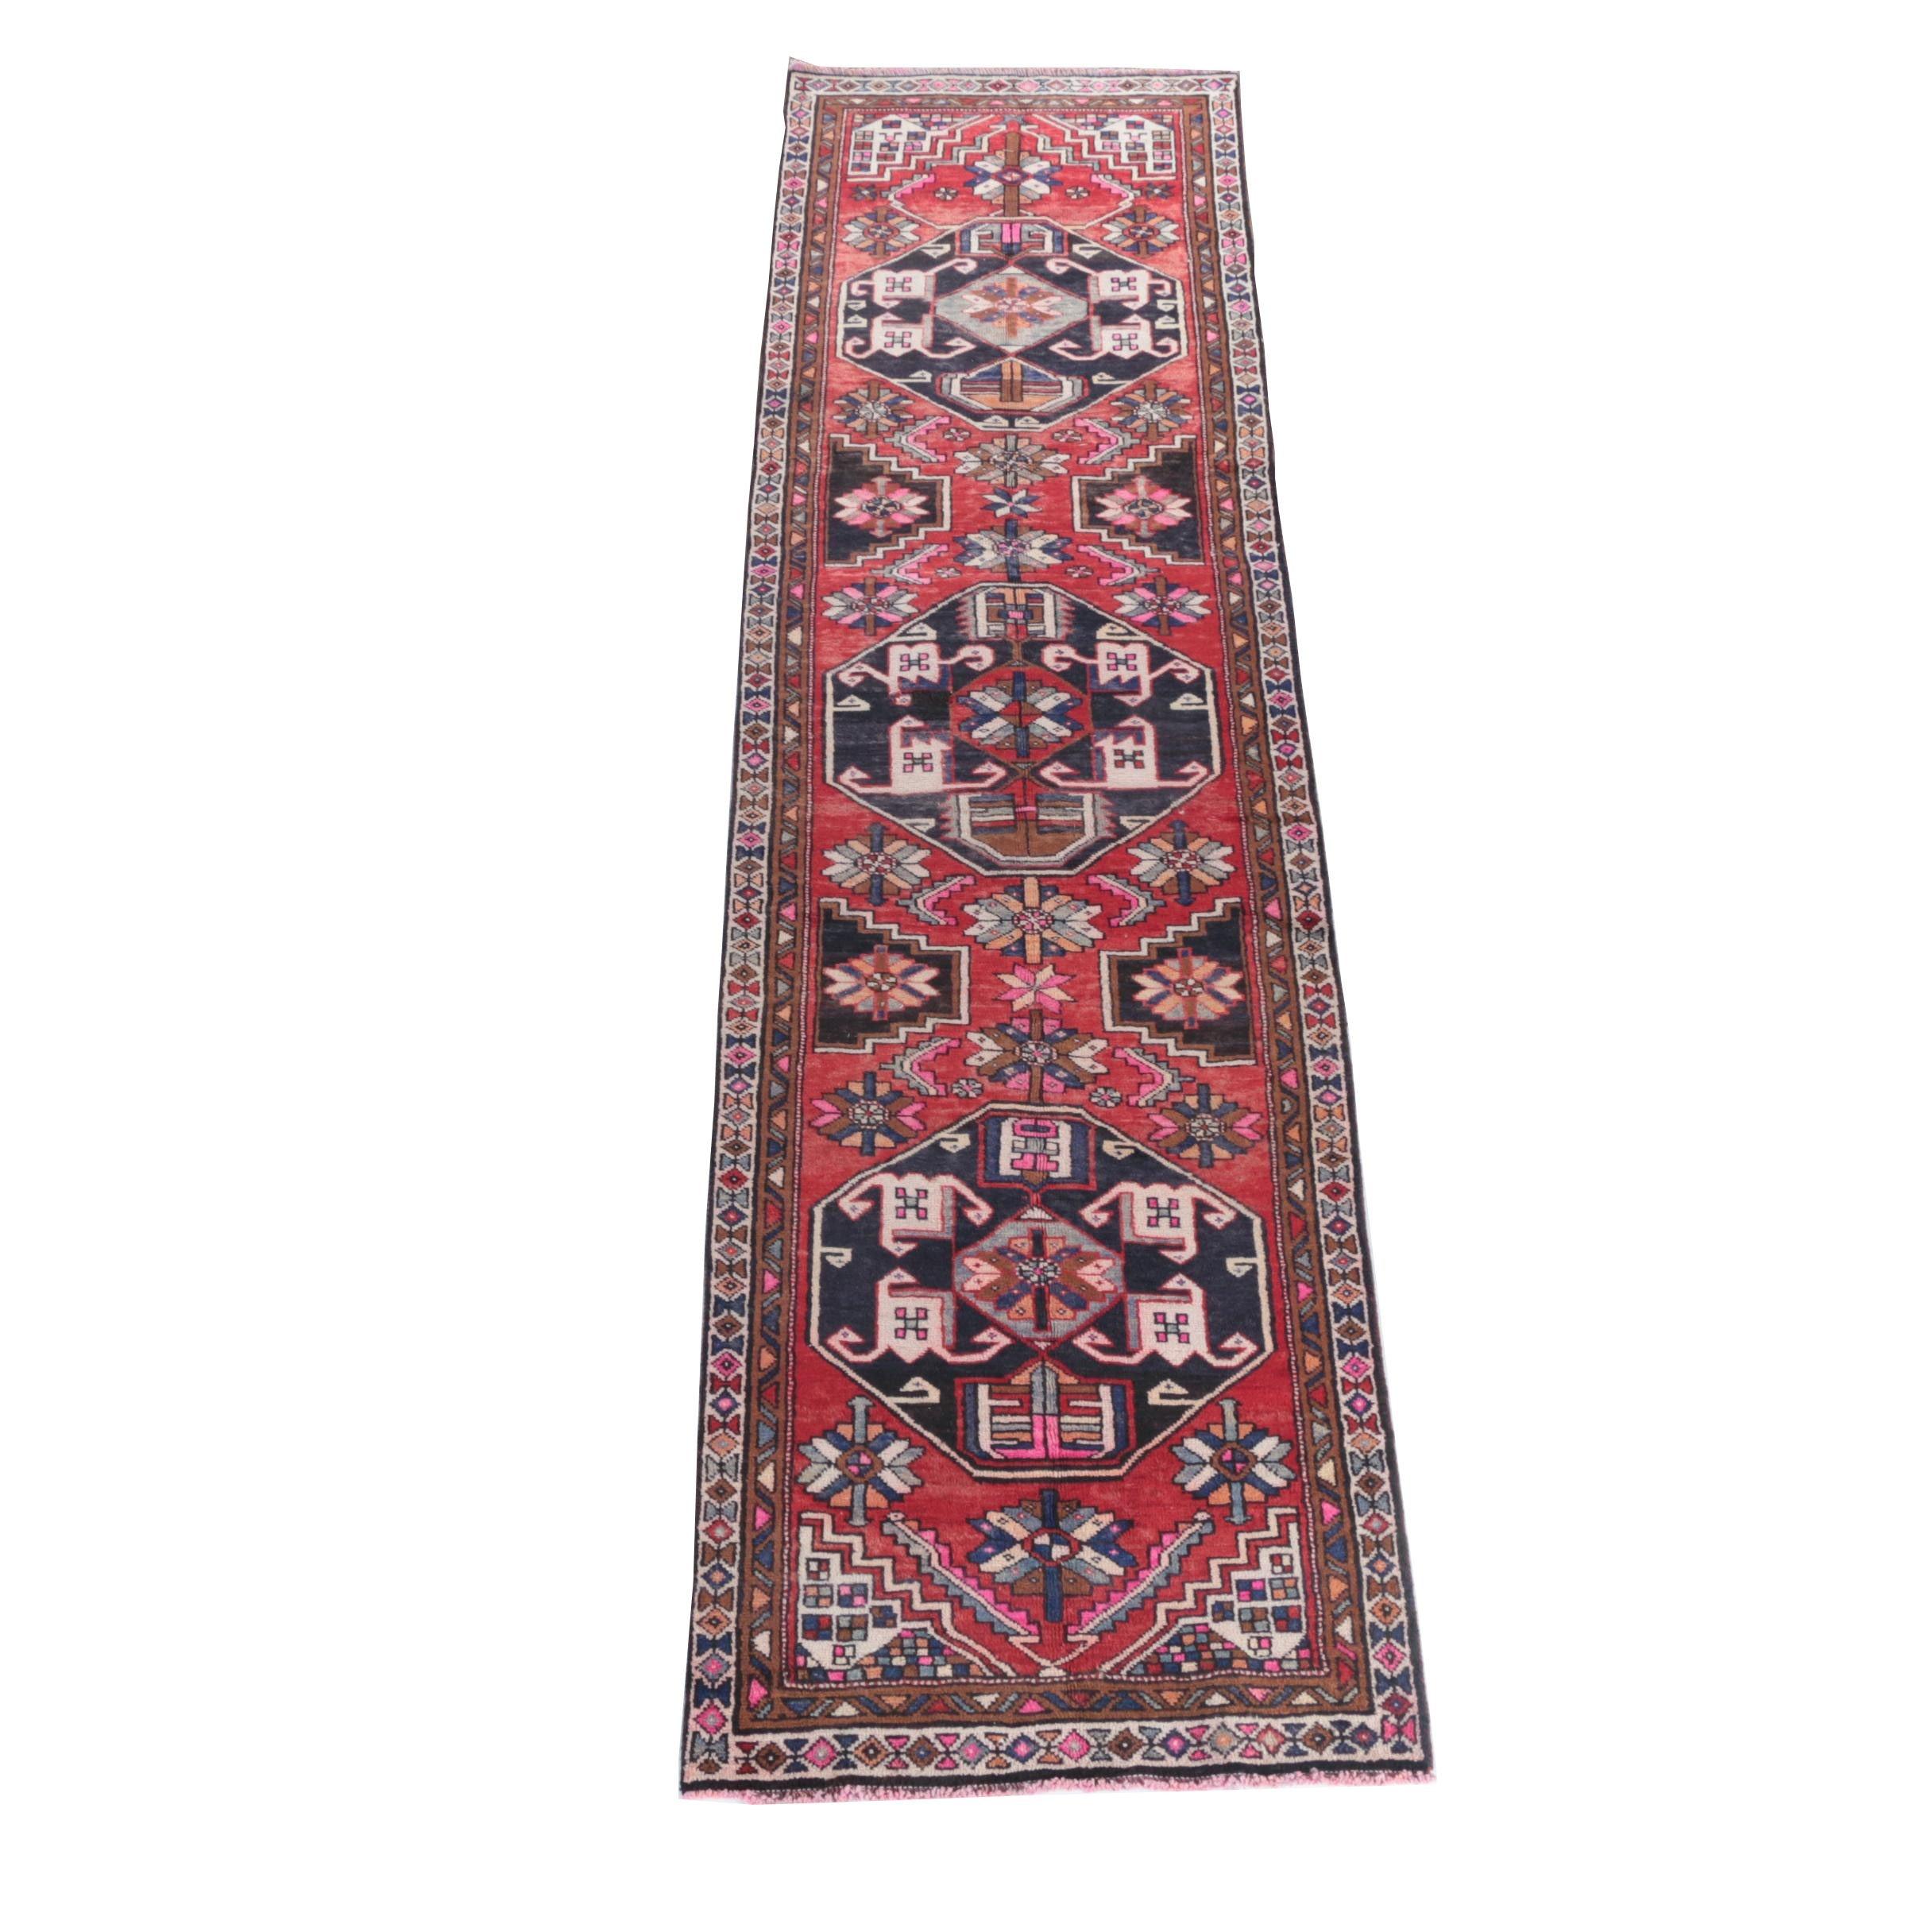 Hand-Knotted Hamadan Wool Carpet Runner